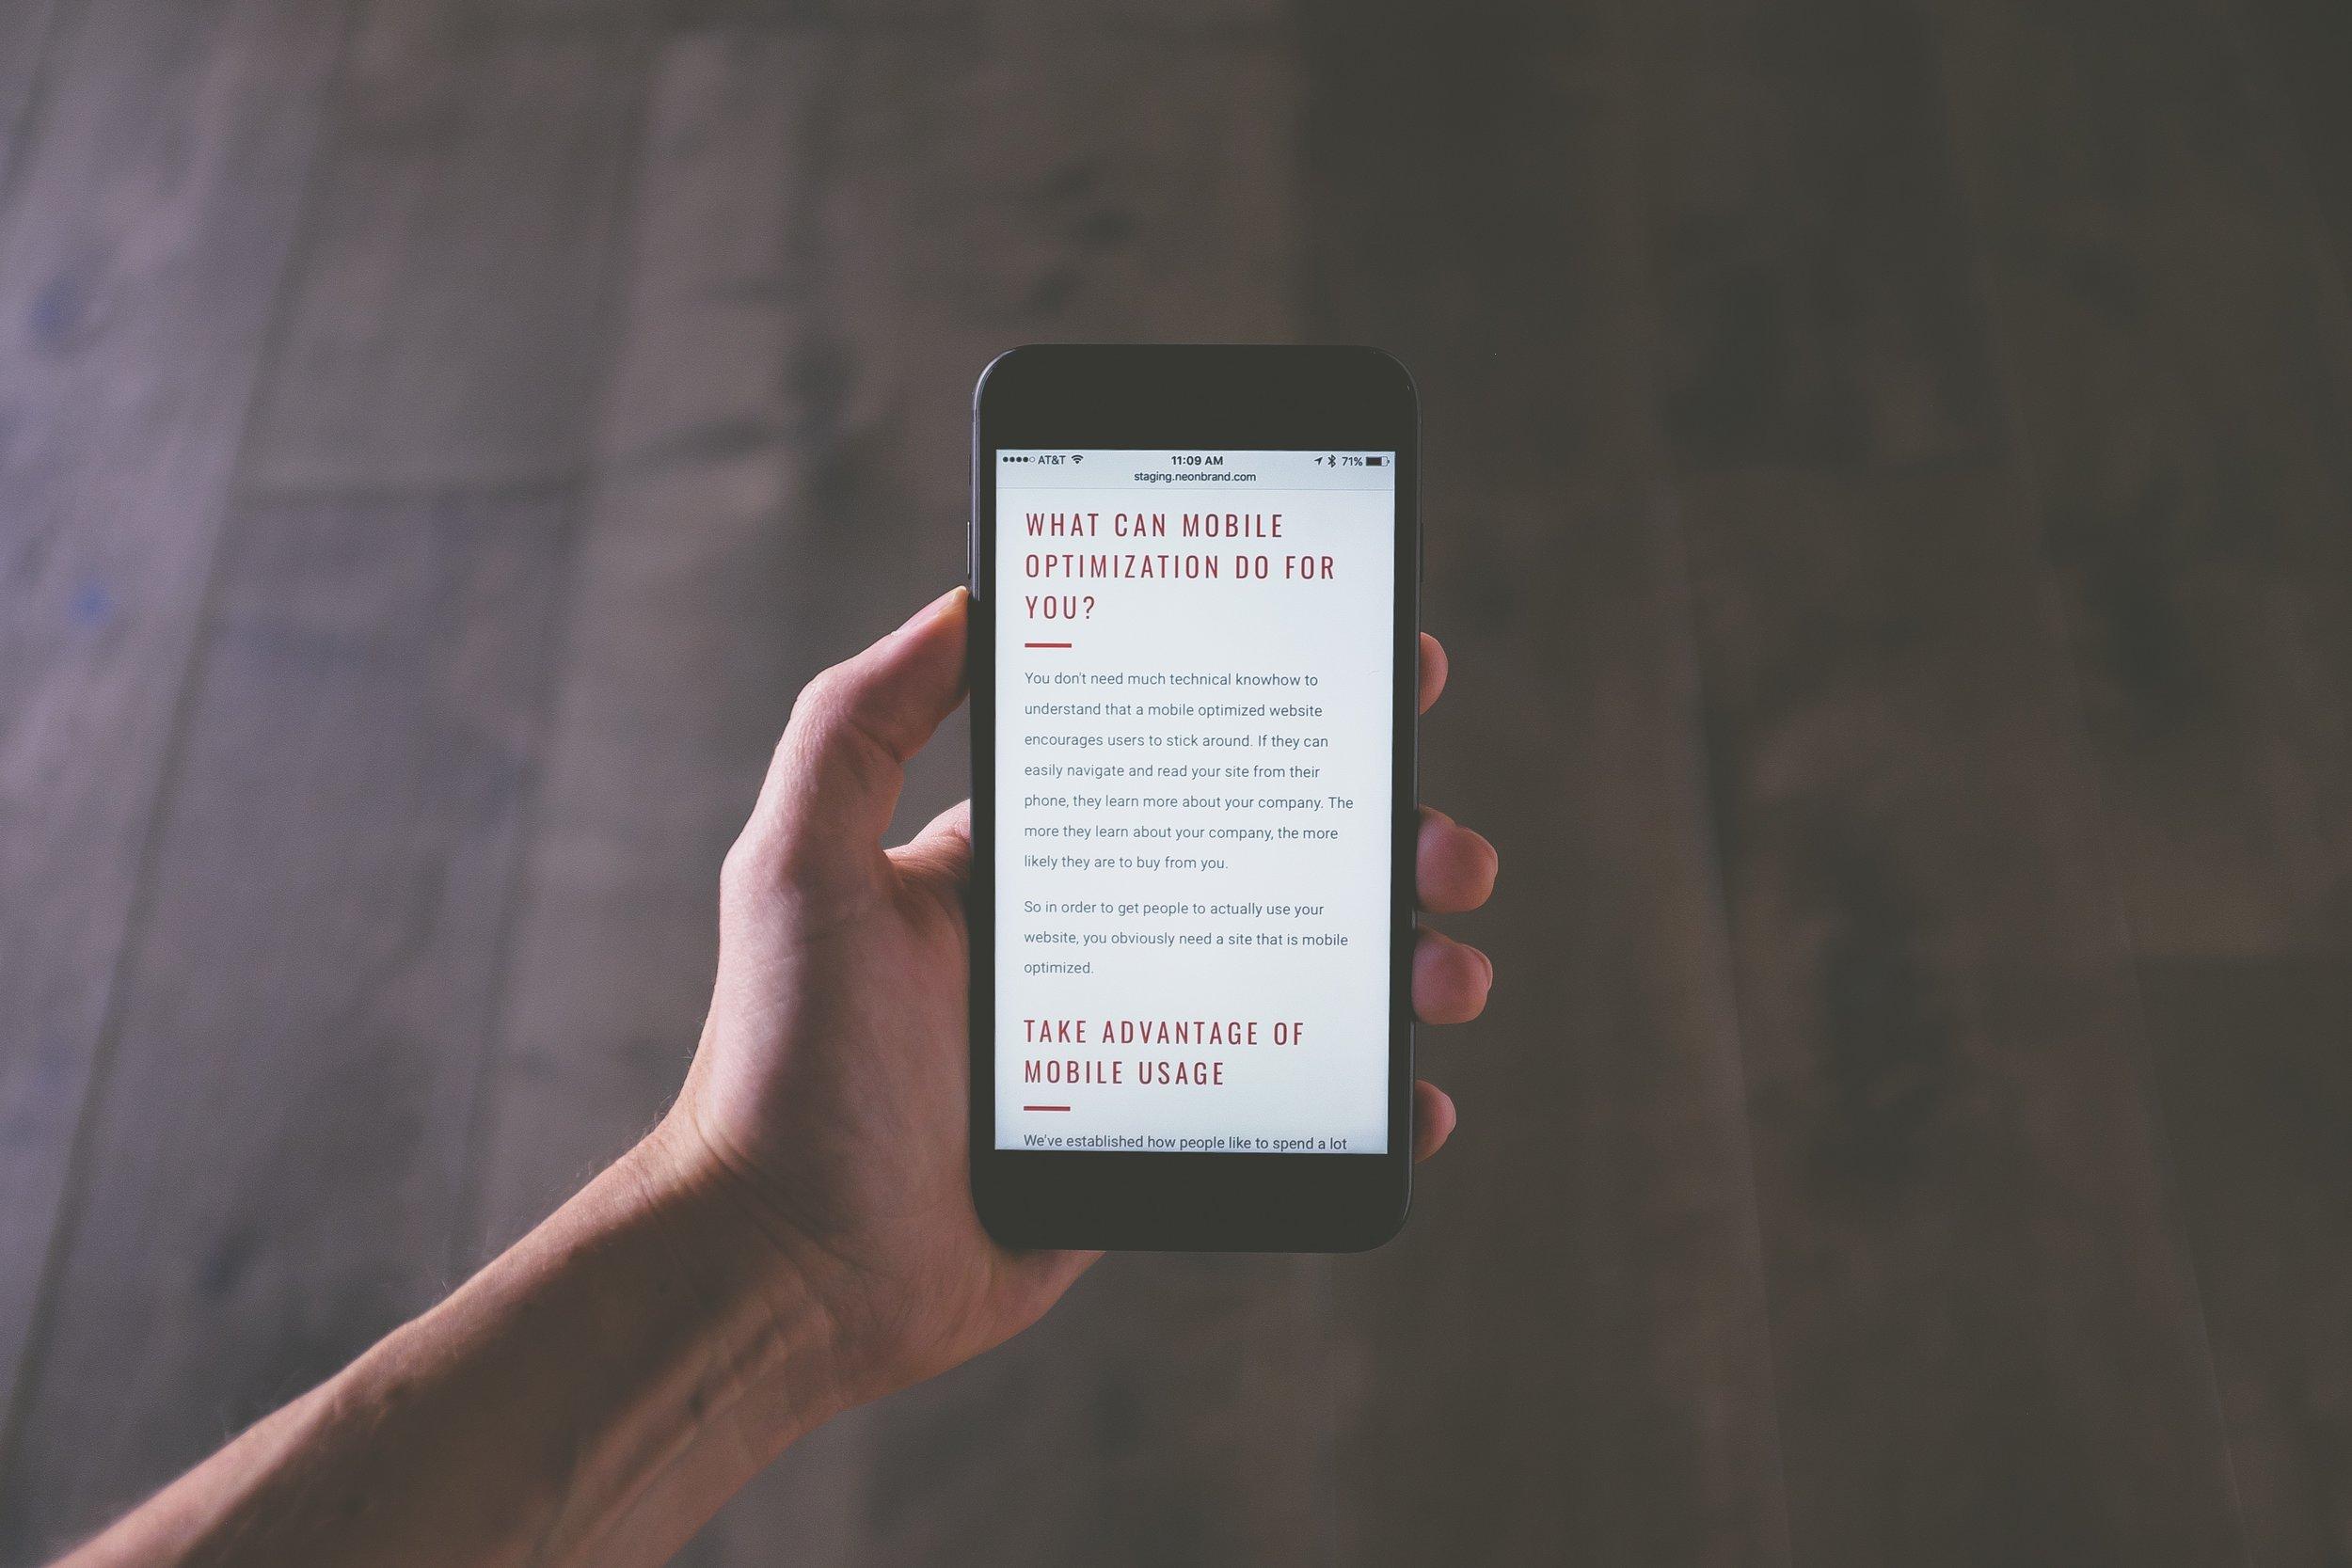 seo-texte-erstellung-koeln.jpg